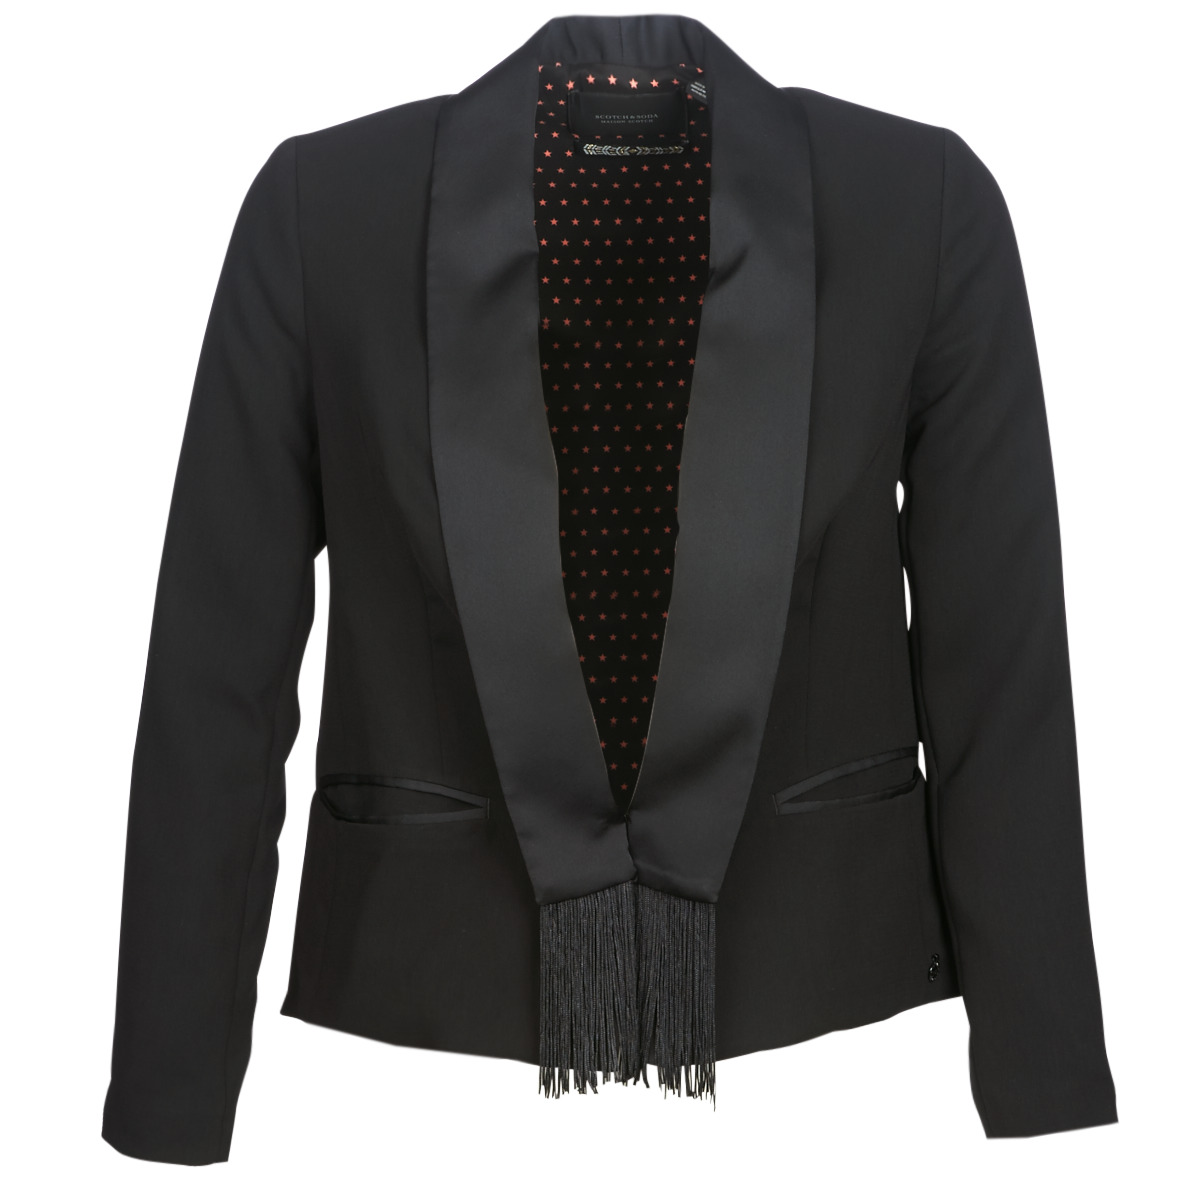 Blazere / jakker Maison Scotch  BOUKOUM